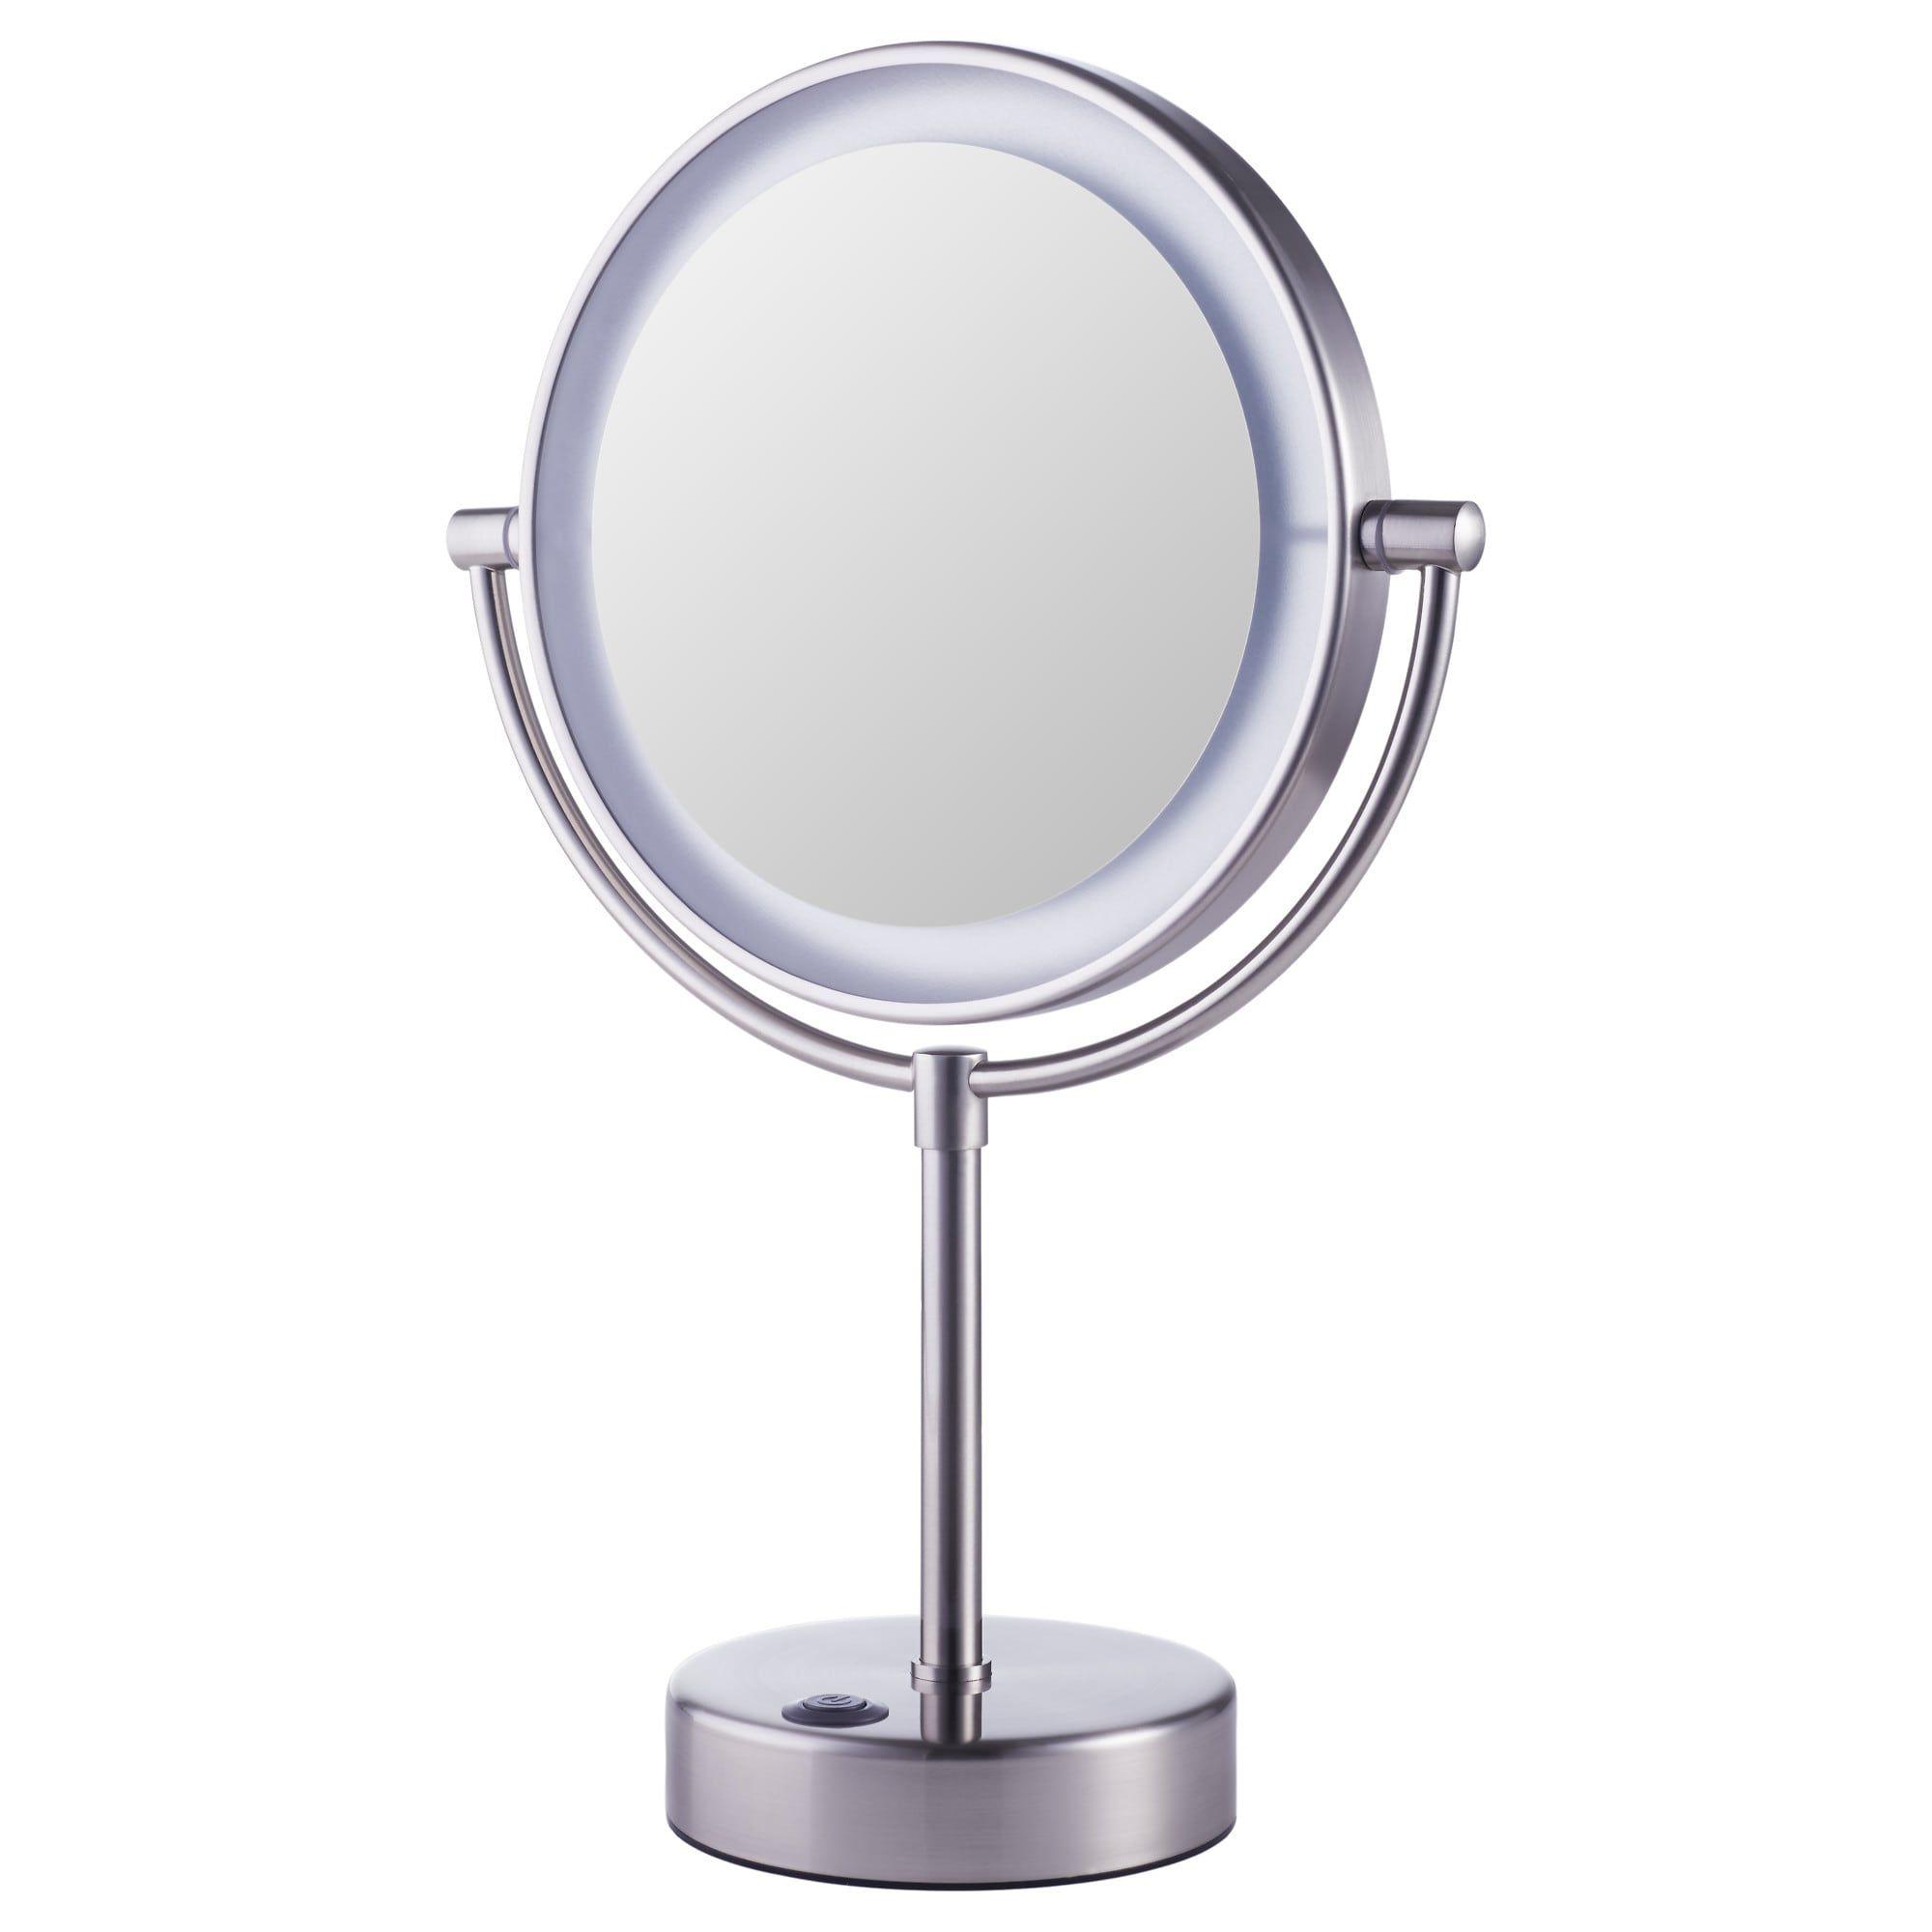 Ikea Kaitum Battery Operated Mirror With Built In Light Mirror With Built In Lights Mirror With Lights Ikea Mirror